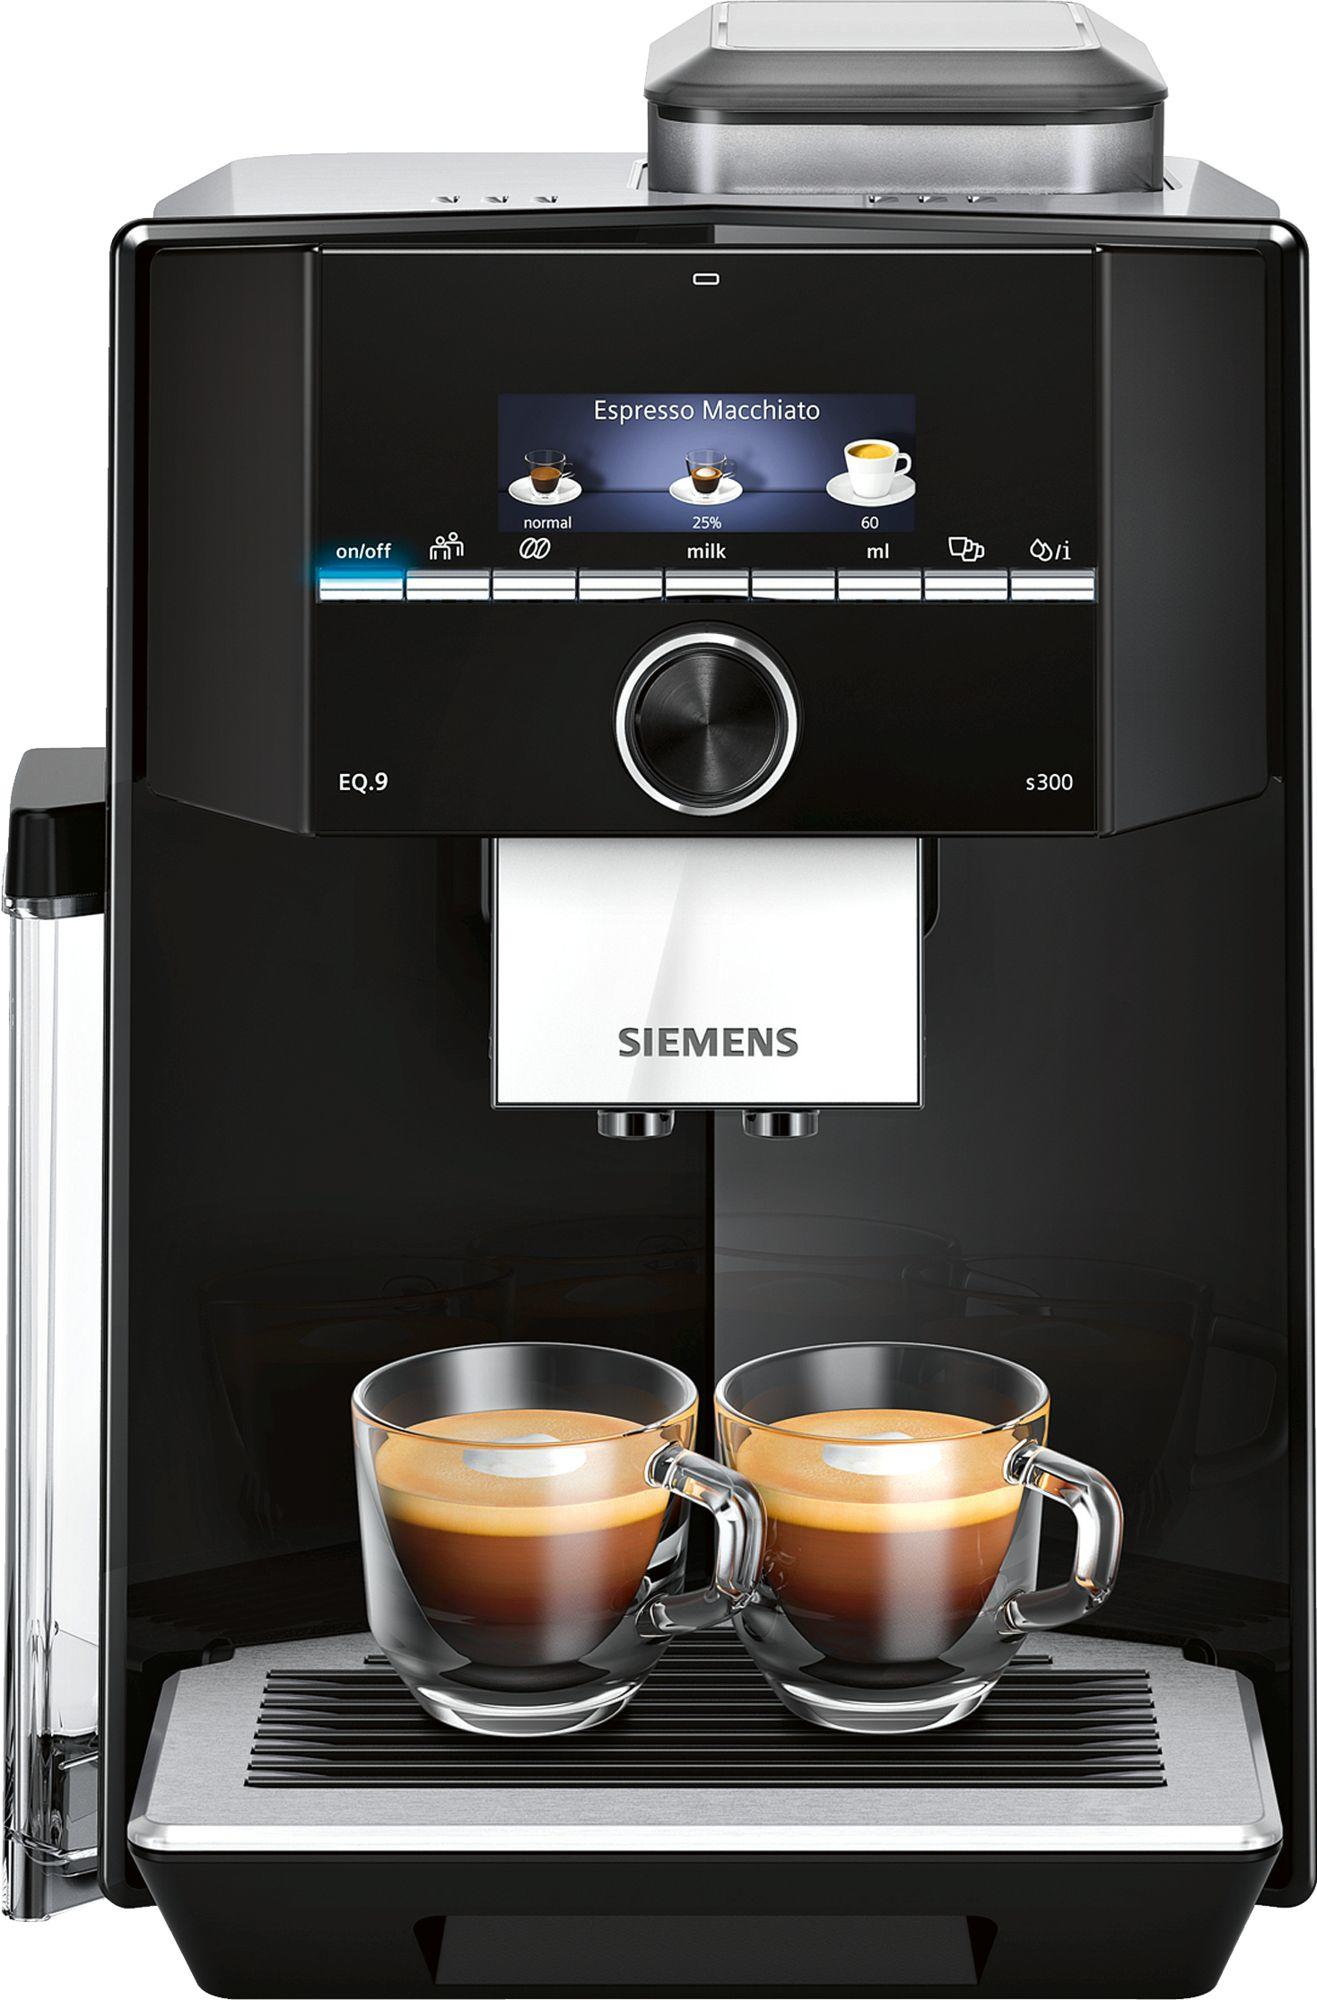 Image of TI923309RW EQ.9 s300 Fully Automatic Coffee Machine